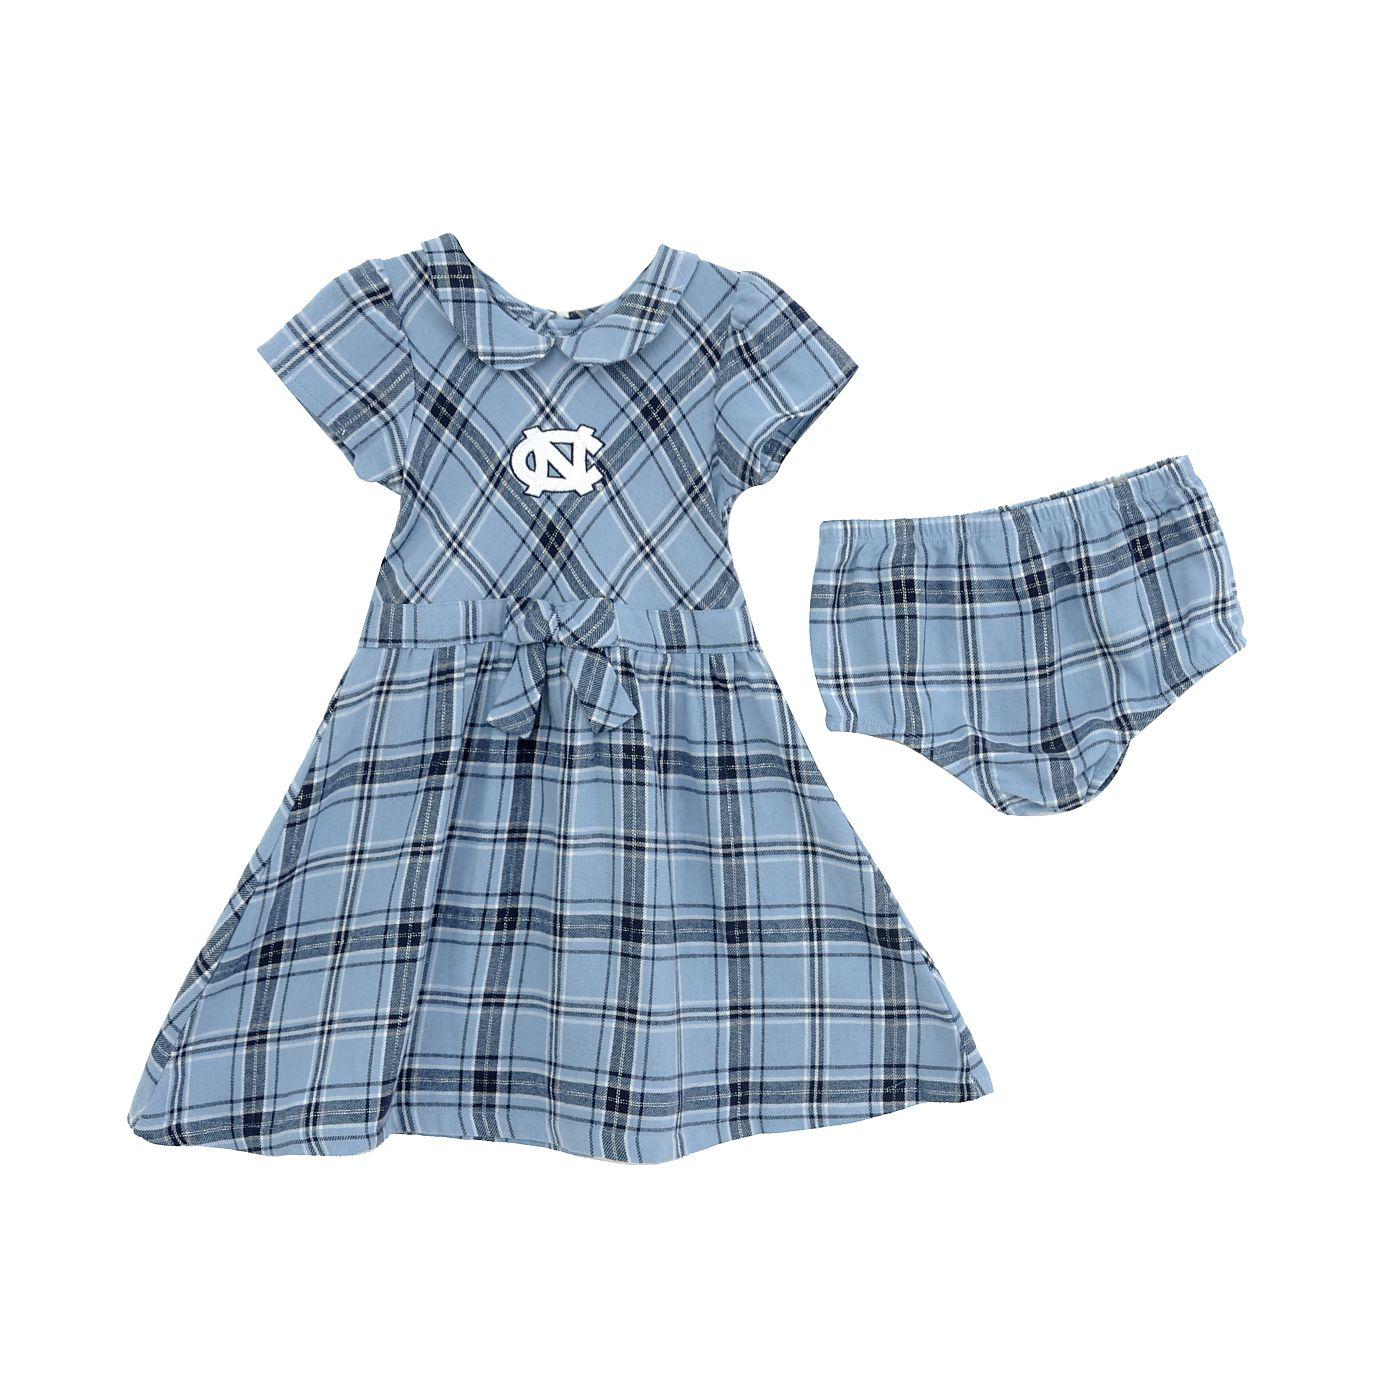 Johnny T-shirt - North Carolina Tar Heels - SALE ITEMS - Toddler ...